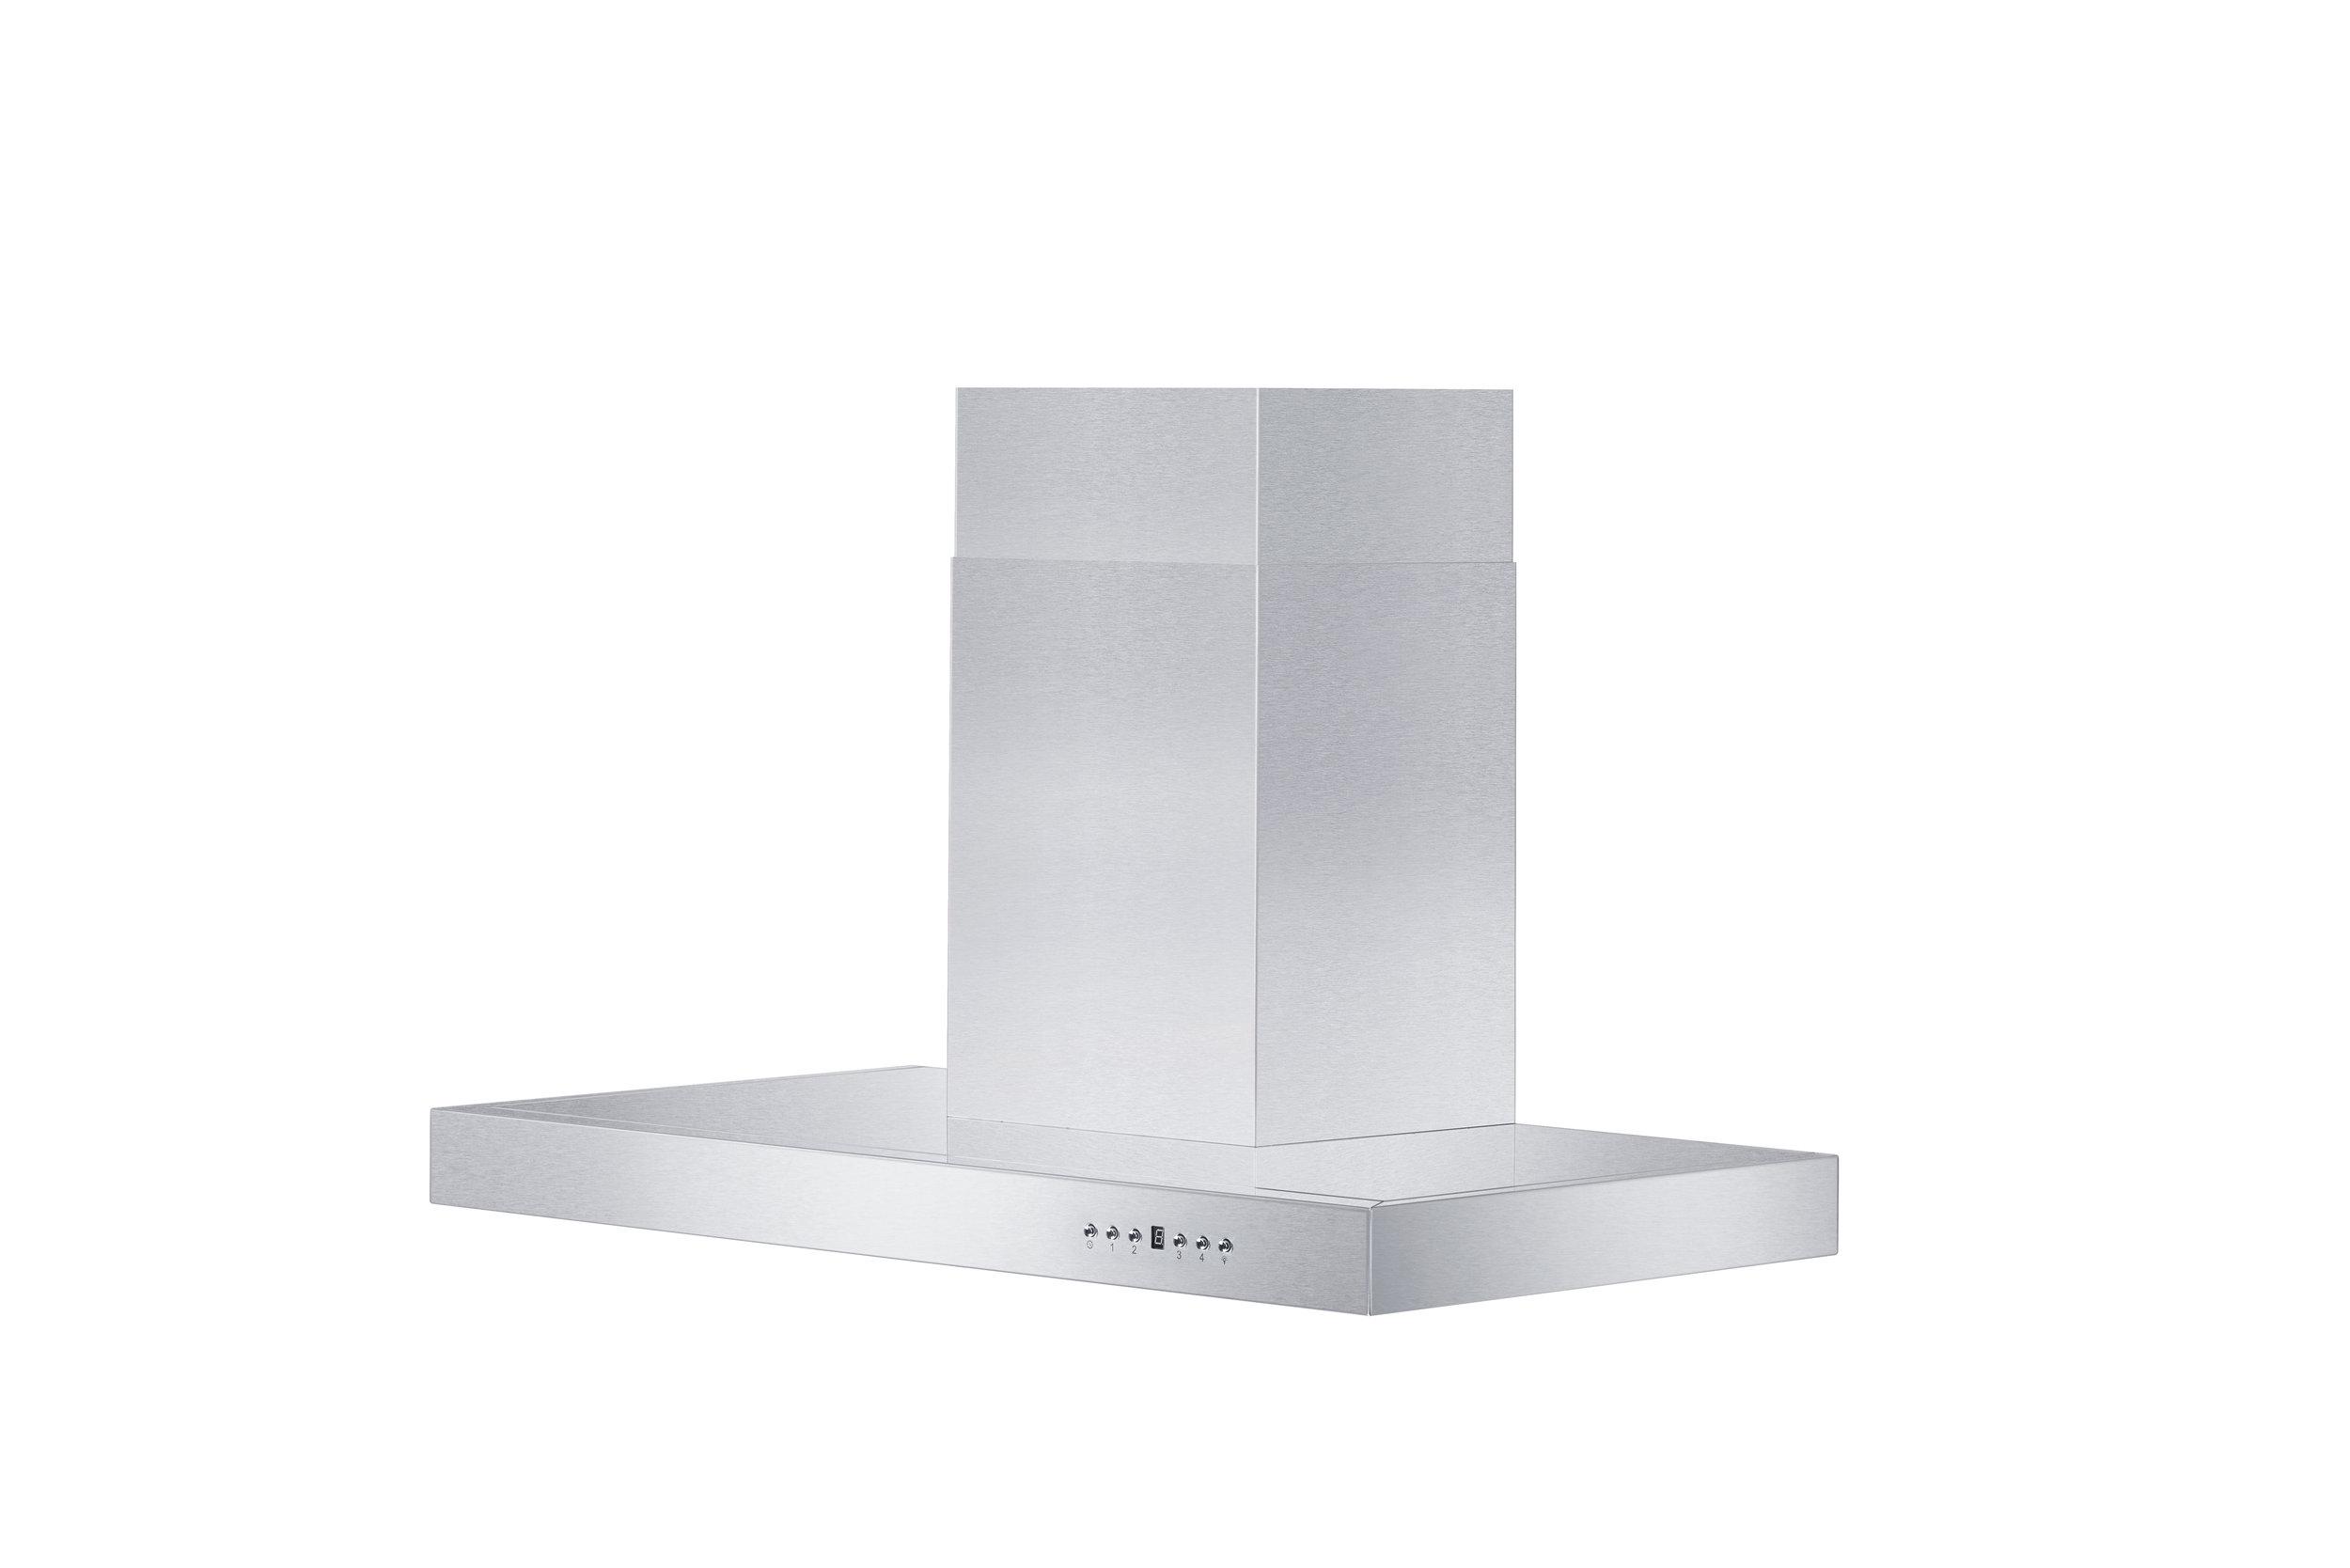 zline-stainless-steel-wall-mounted-range-hood-KE-new-main.jpg